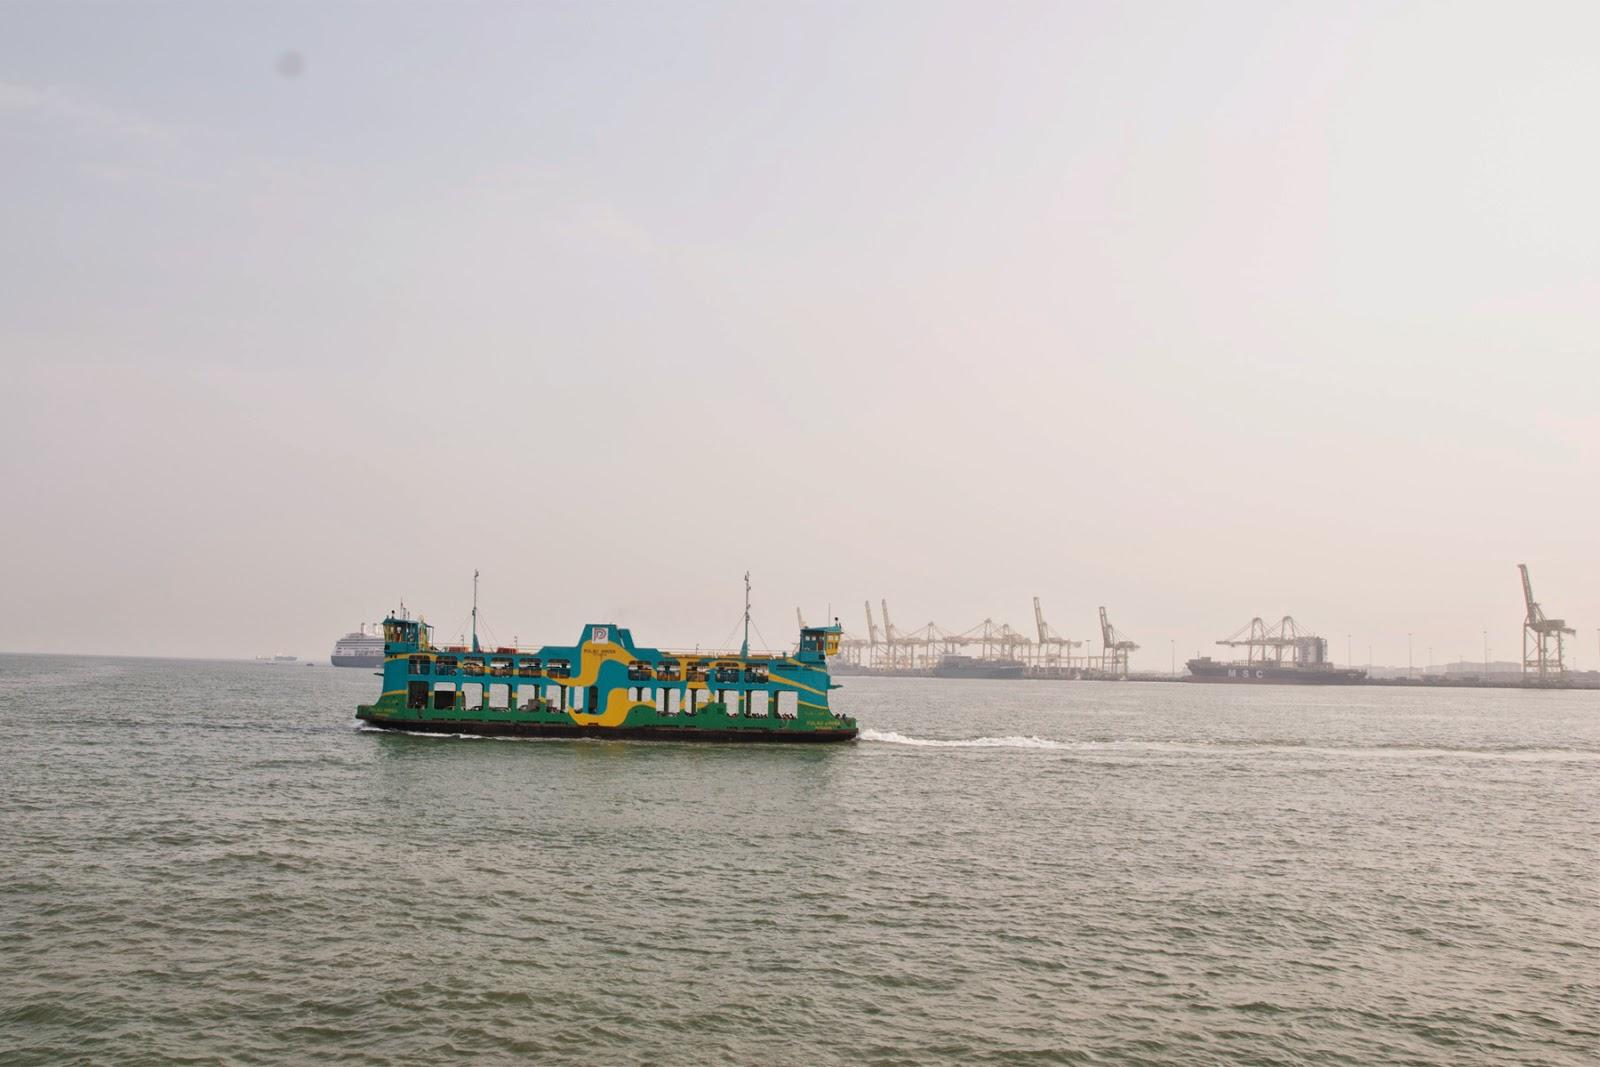 Feri, Pulau Pinang, Laut, Permandangan, Gambar Cantik, arzmoha